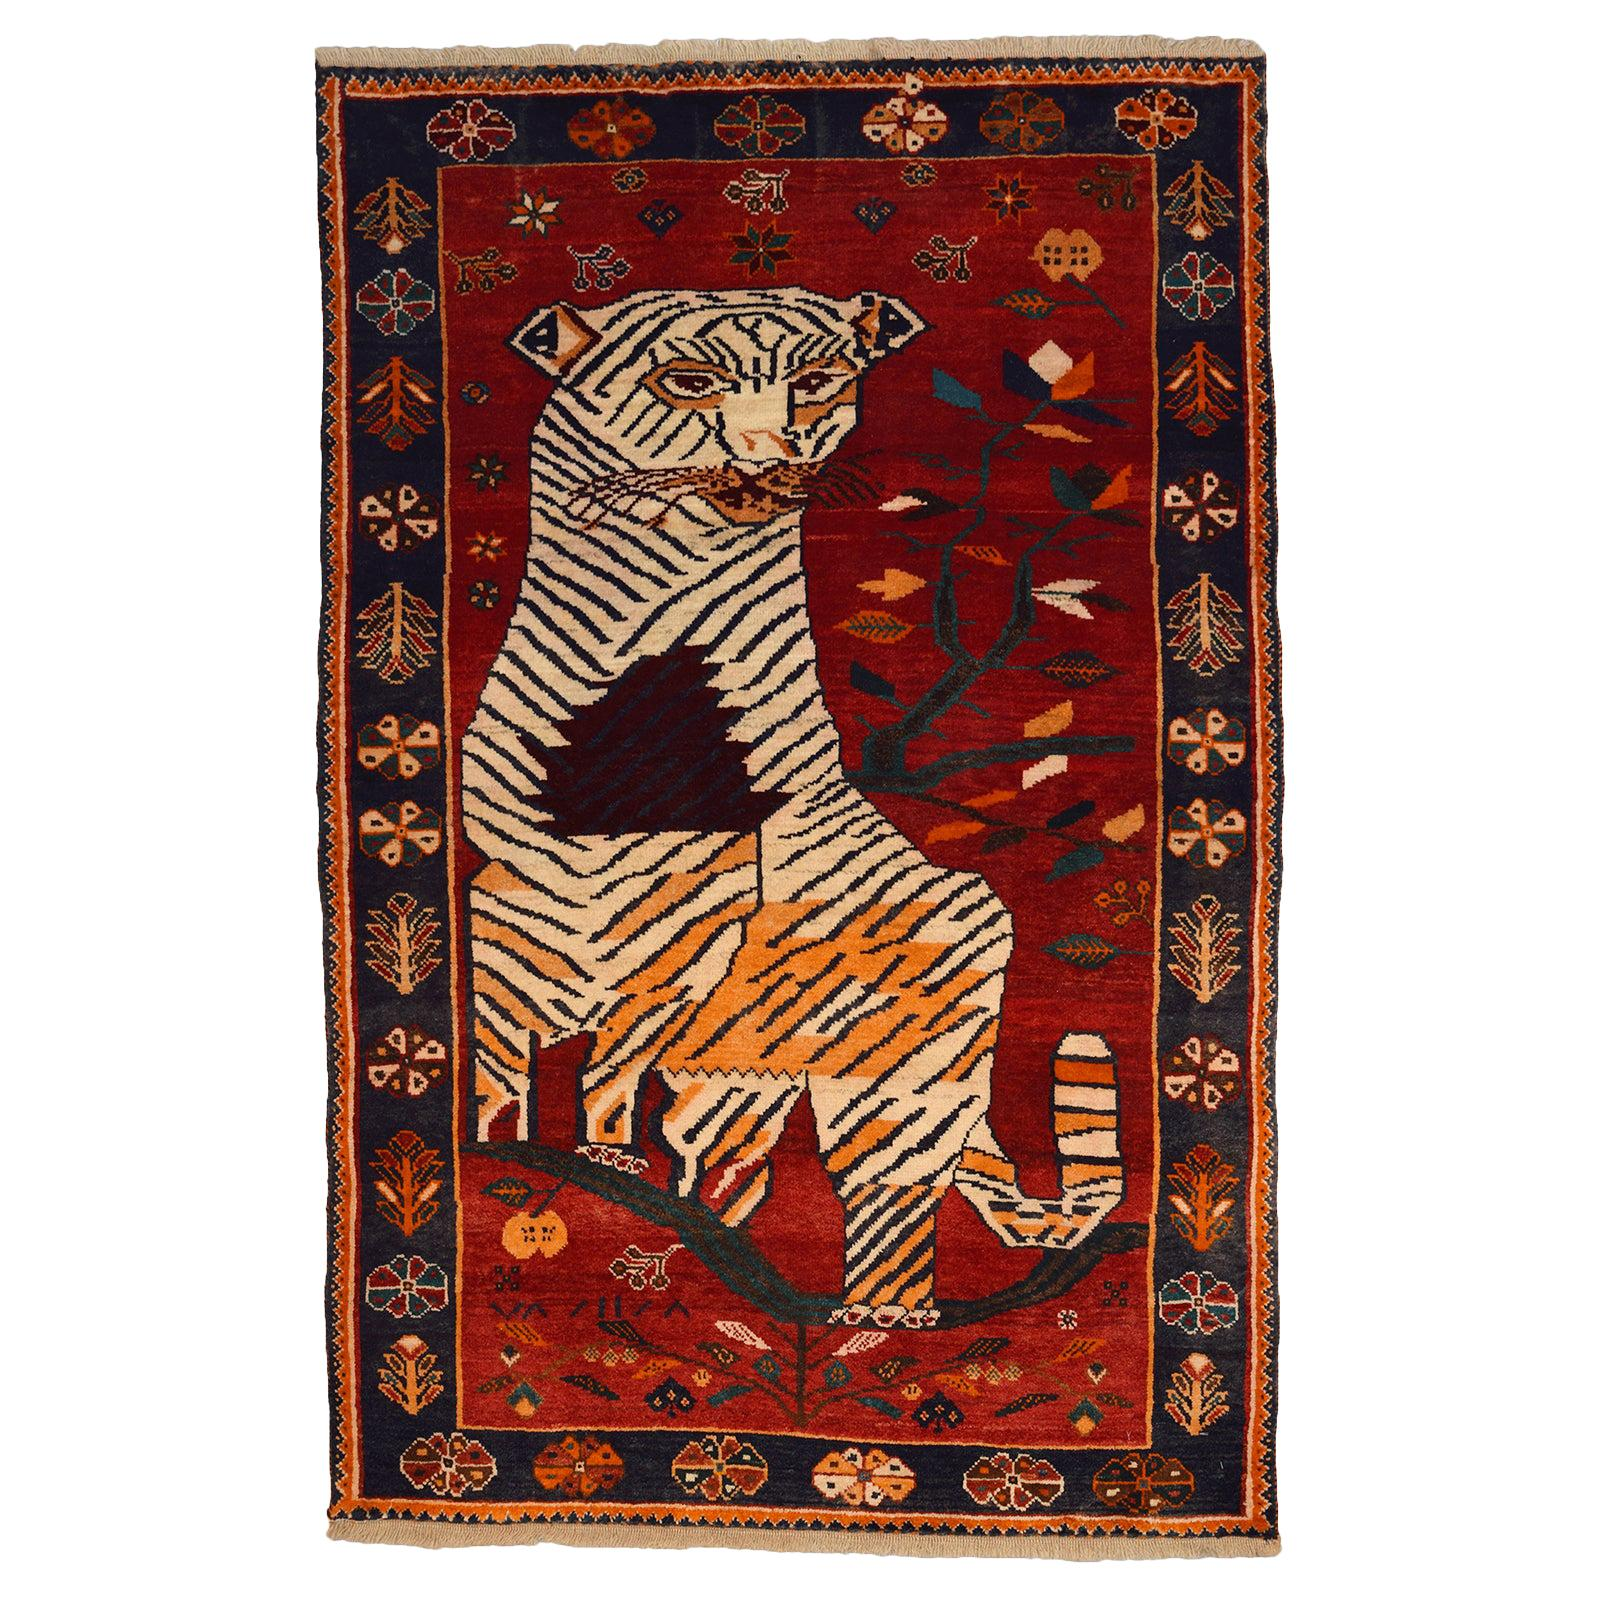 Persian Qashqai Tiger Carpet in Pure Handspun Wool and Vegetable Dyes circa 1940